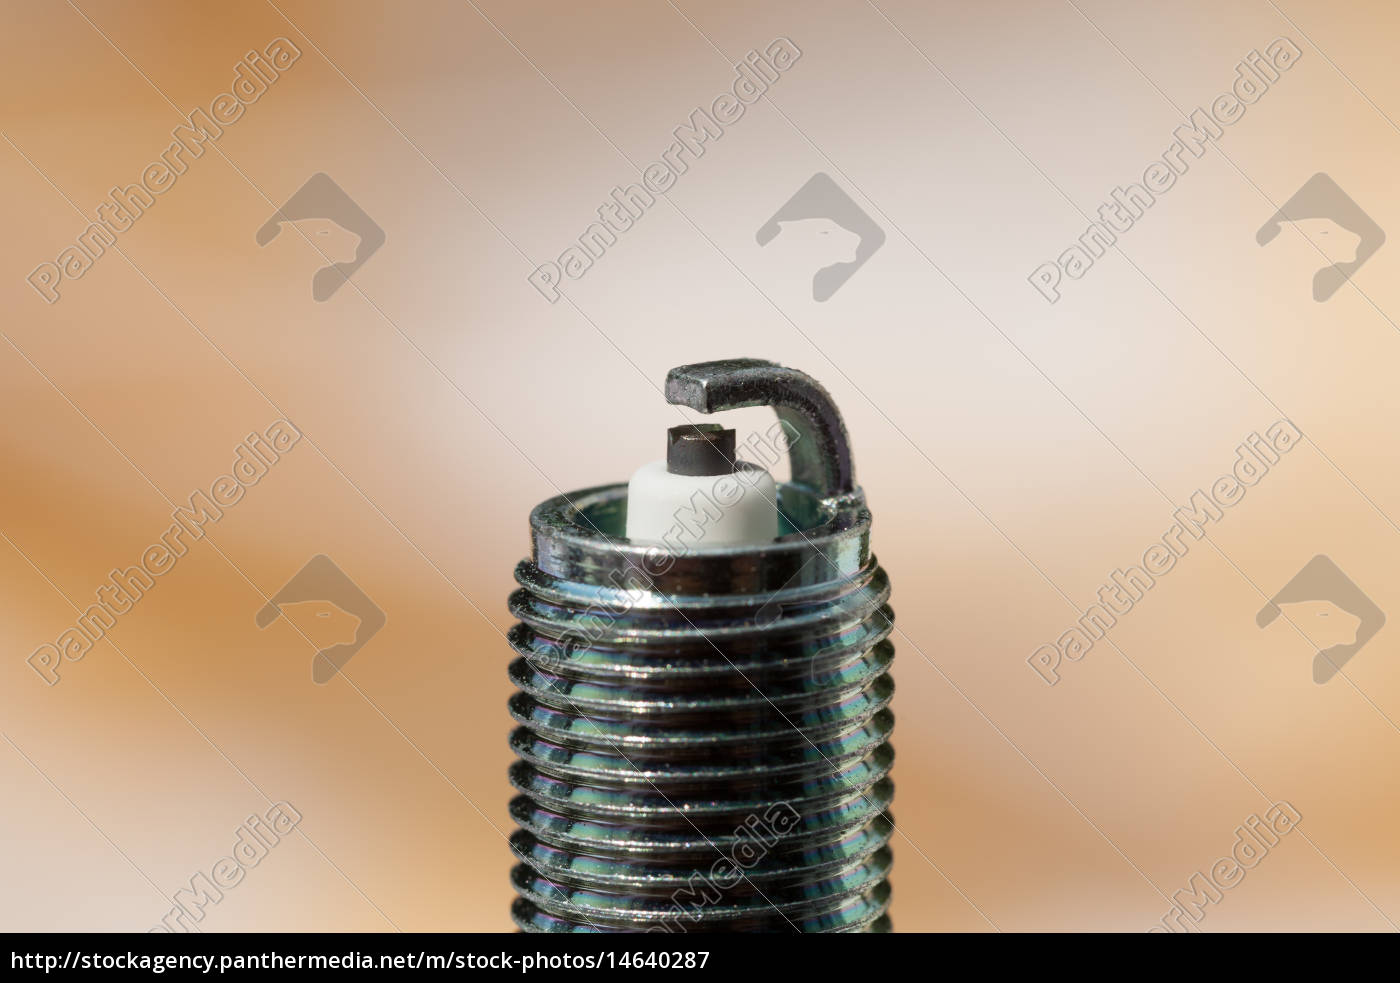 auto, service., new, spark, plug, as - 14640287